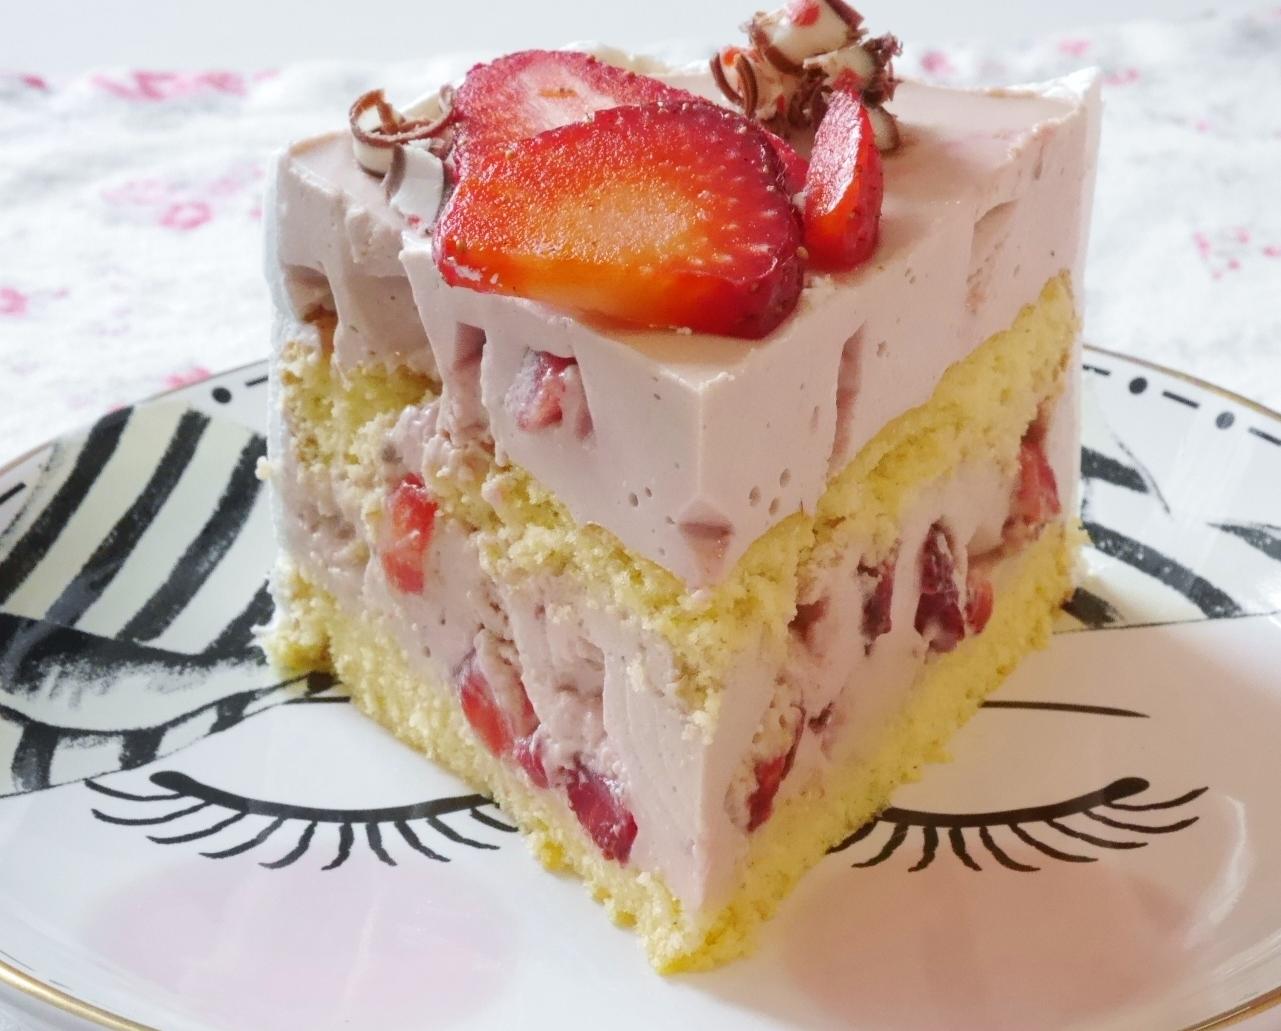 Erdbeer Schoko Torte Fraulein Ella